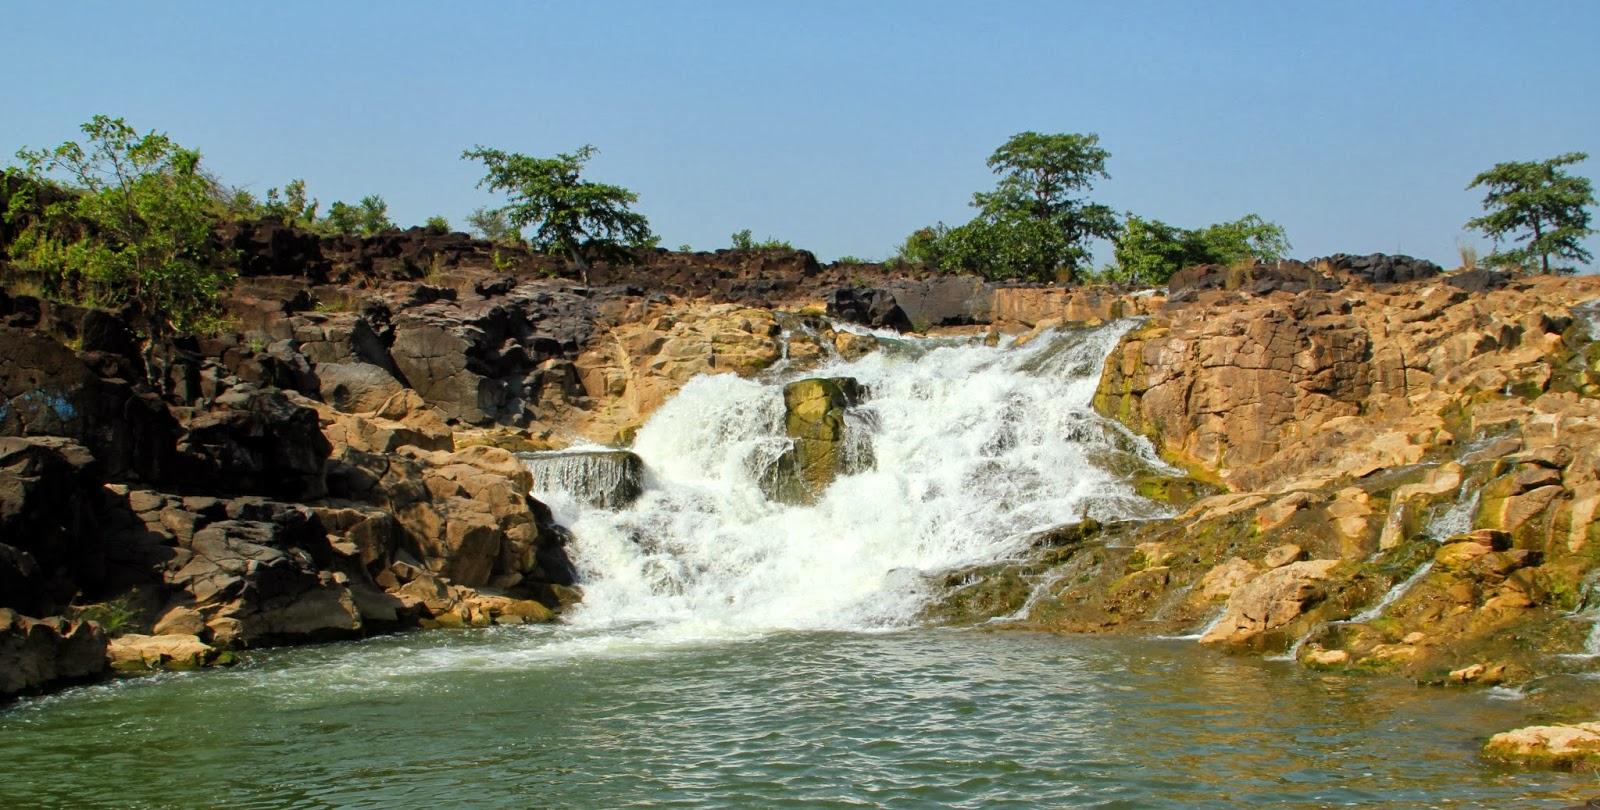 A Trip To Kanakai Waterfalls in Telangana Will Refresh You